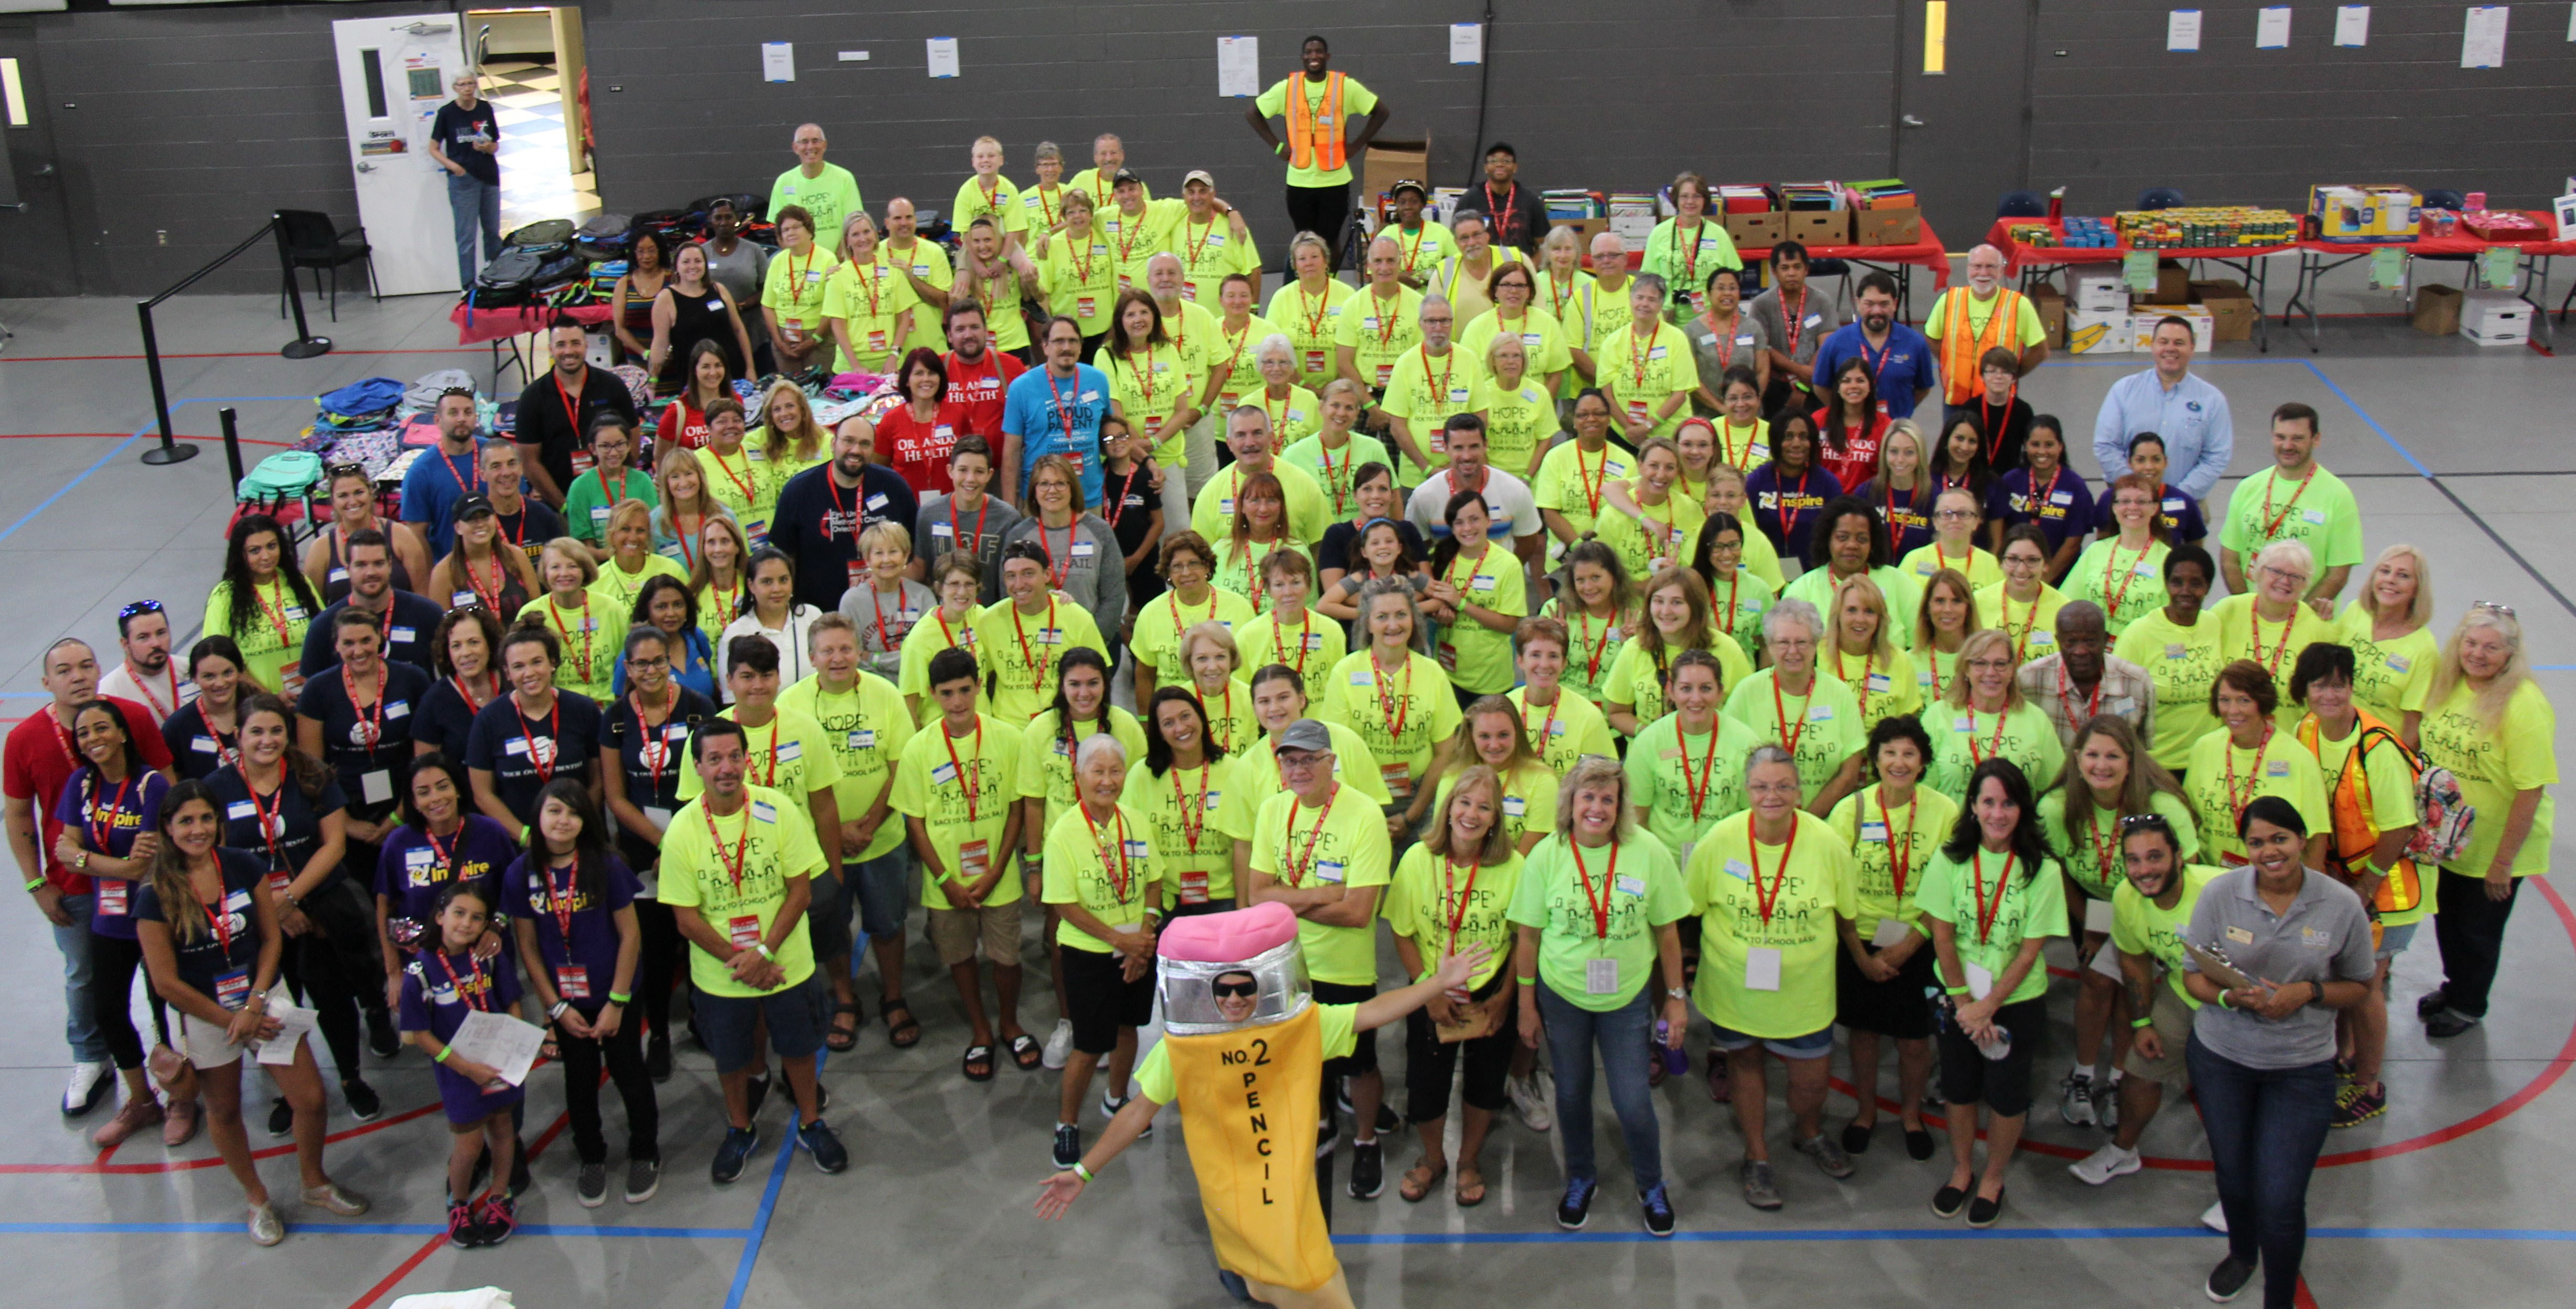 10th Annual Back to School Bash Presented by Orlando Health